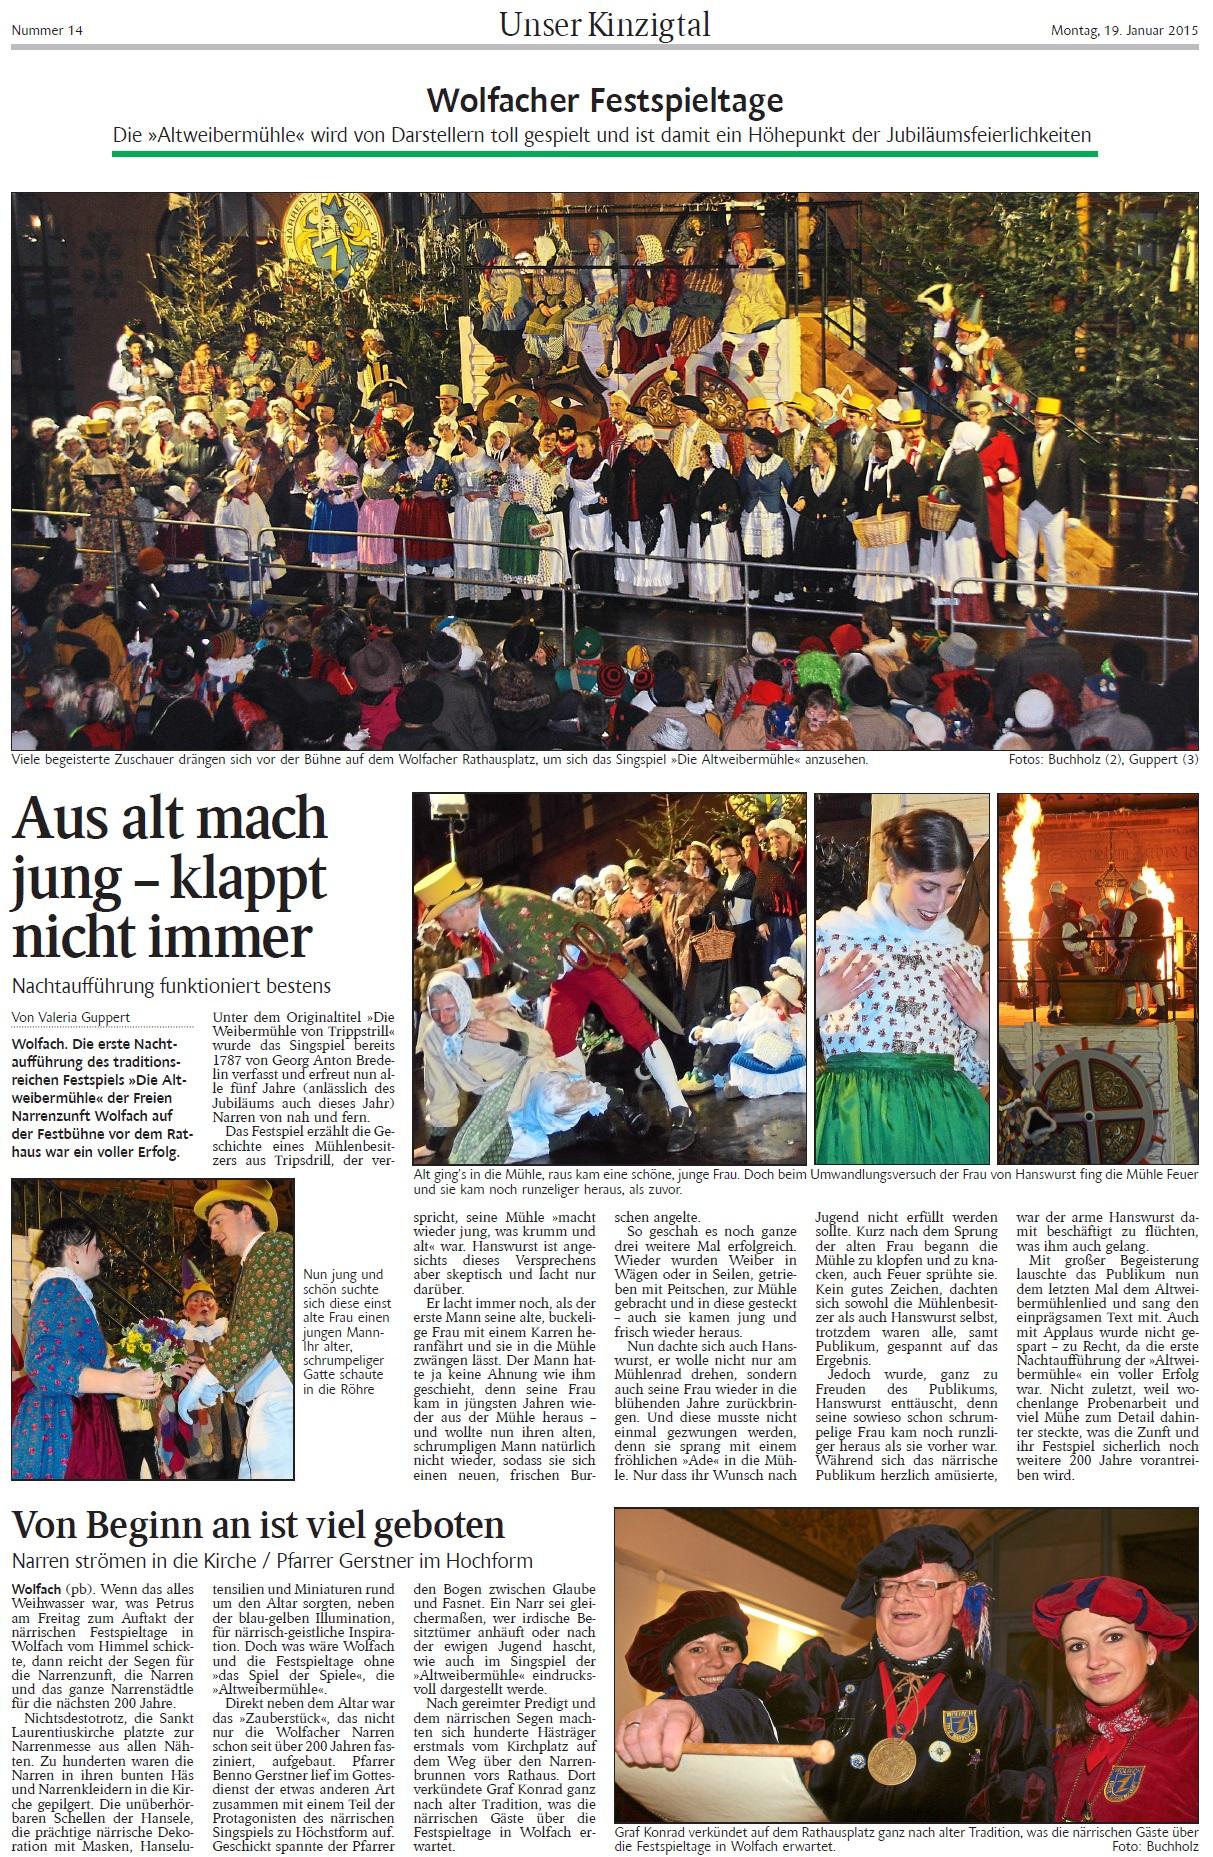 Schwarzwälder Bote (2015-01-19a_SB)